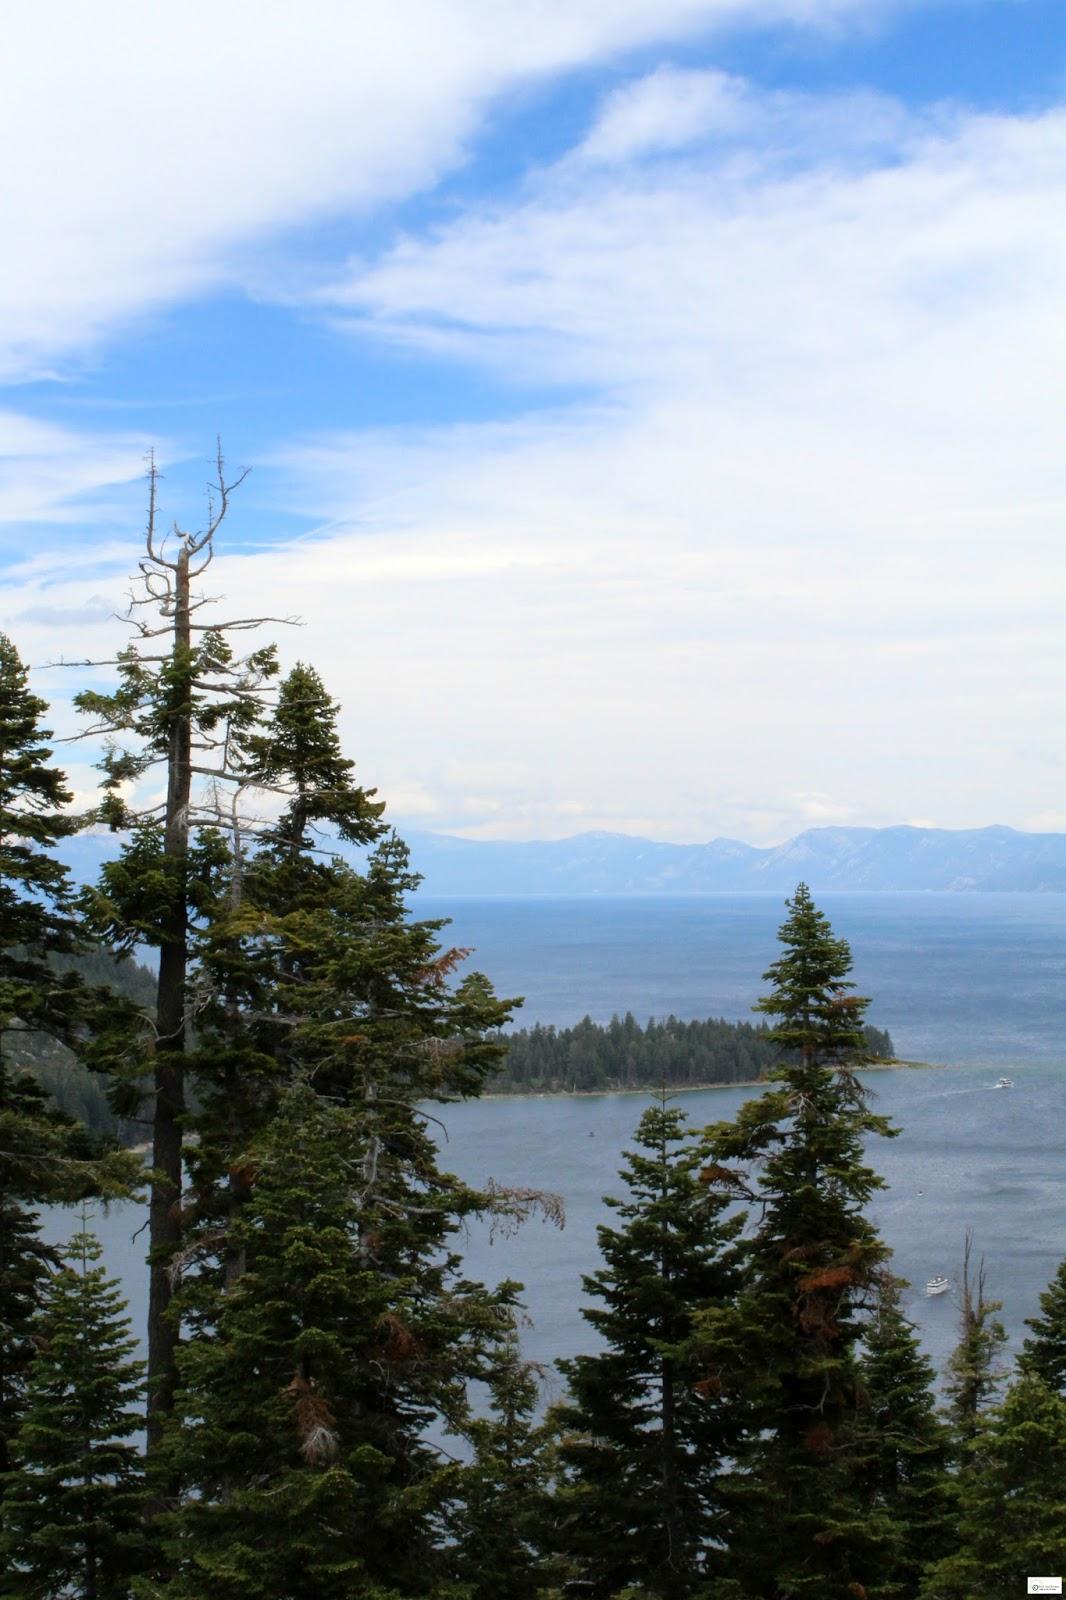 Lake Tahoe California Galaxy Note 3 Wallpapers Hd 1080x1920: Emerald Bay, Lake Tahoe// California